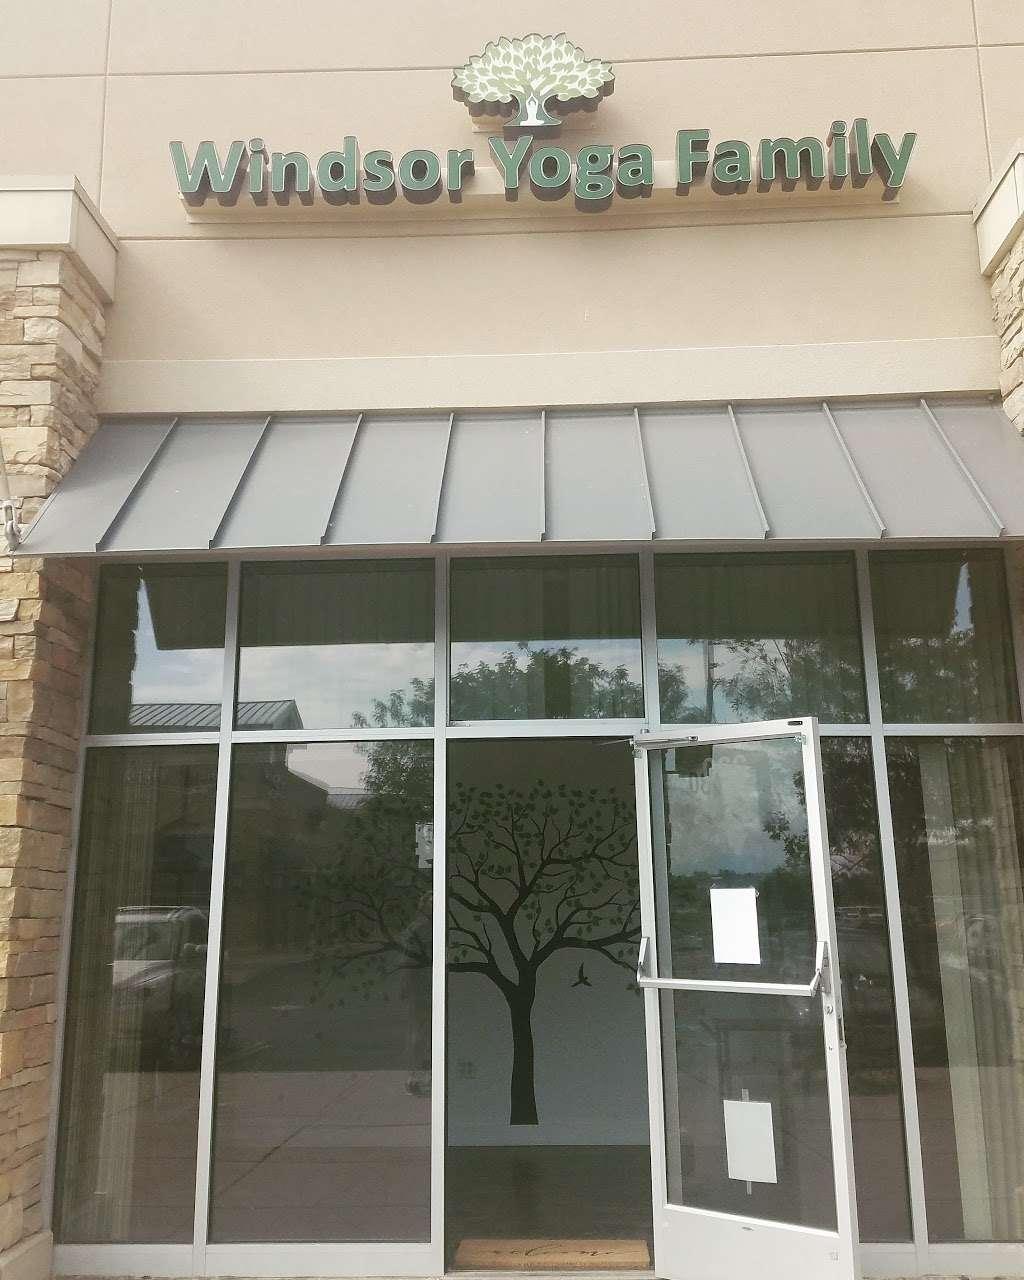 Windsor Yoga Family - gym  | Photo 8 of 9 | Address: 1520 Main St, Windsor, CO 80550, USA | Phone: (970) 481-7906